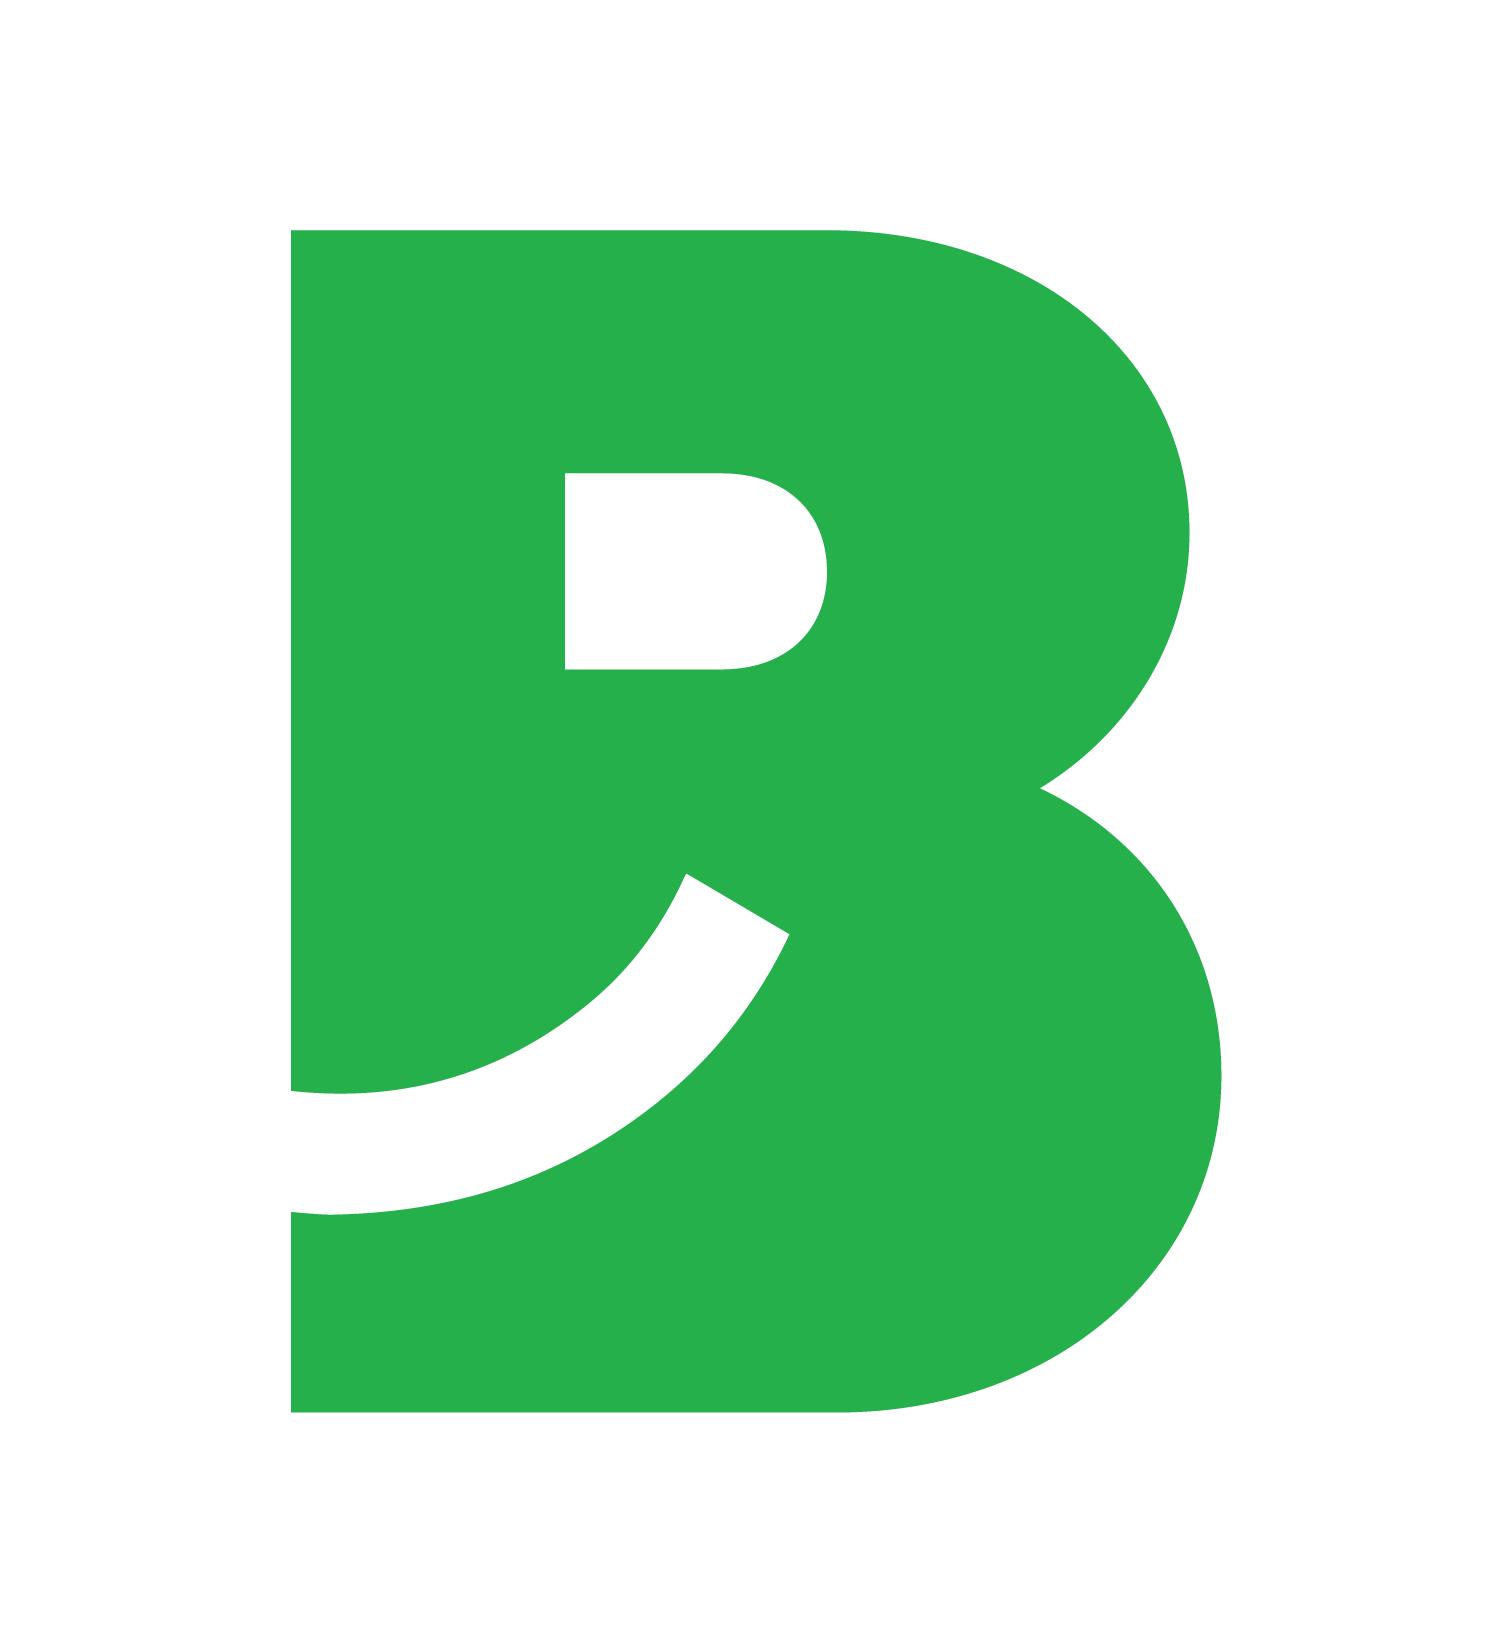 BizzPing Logo - Great Customer Satisfaction Made Simple